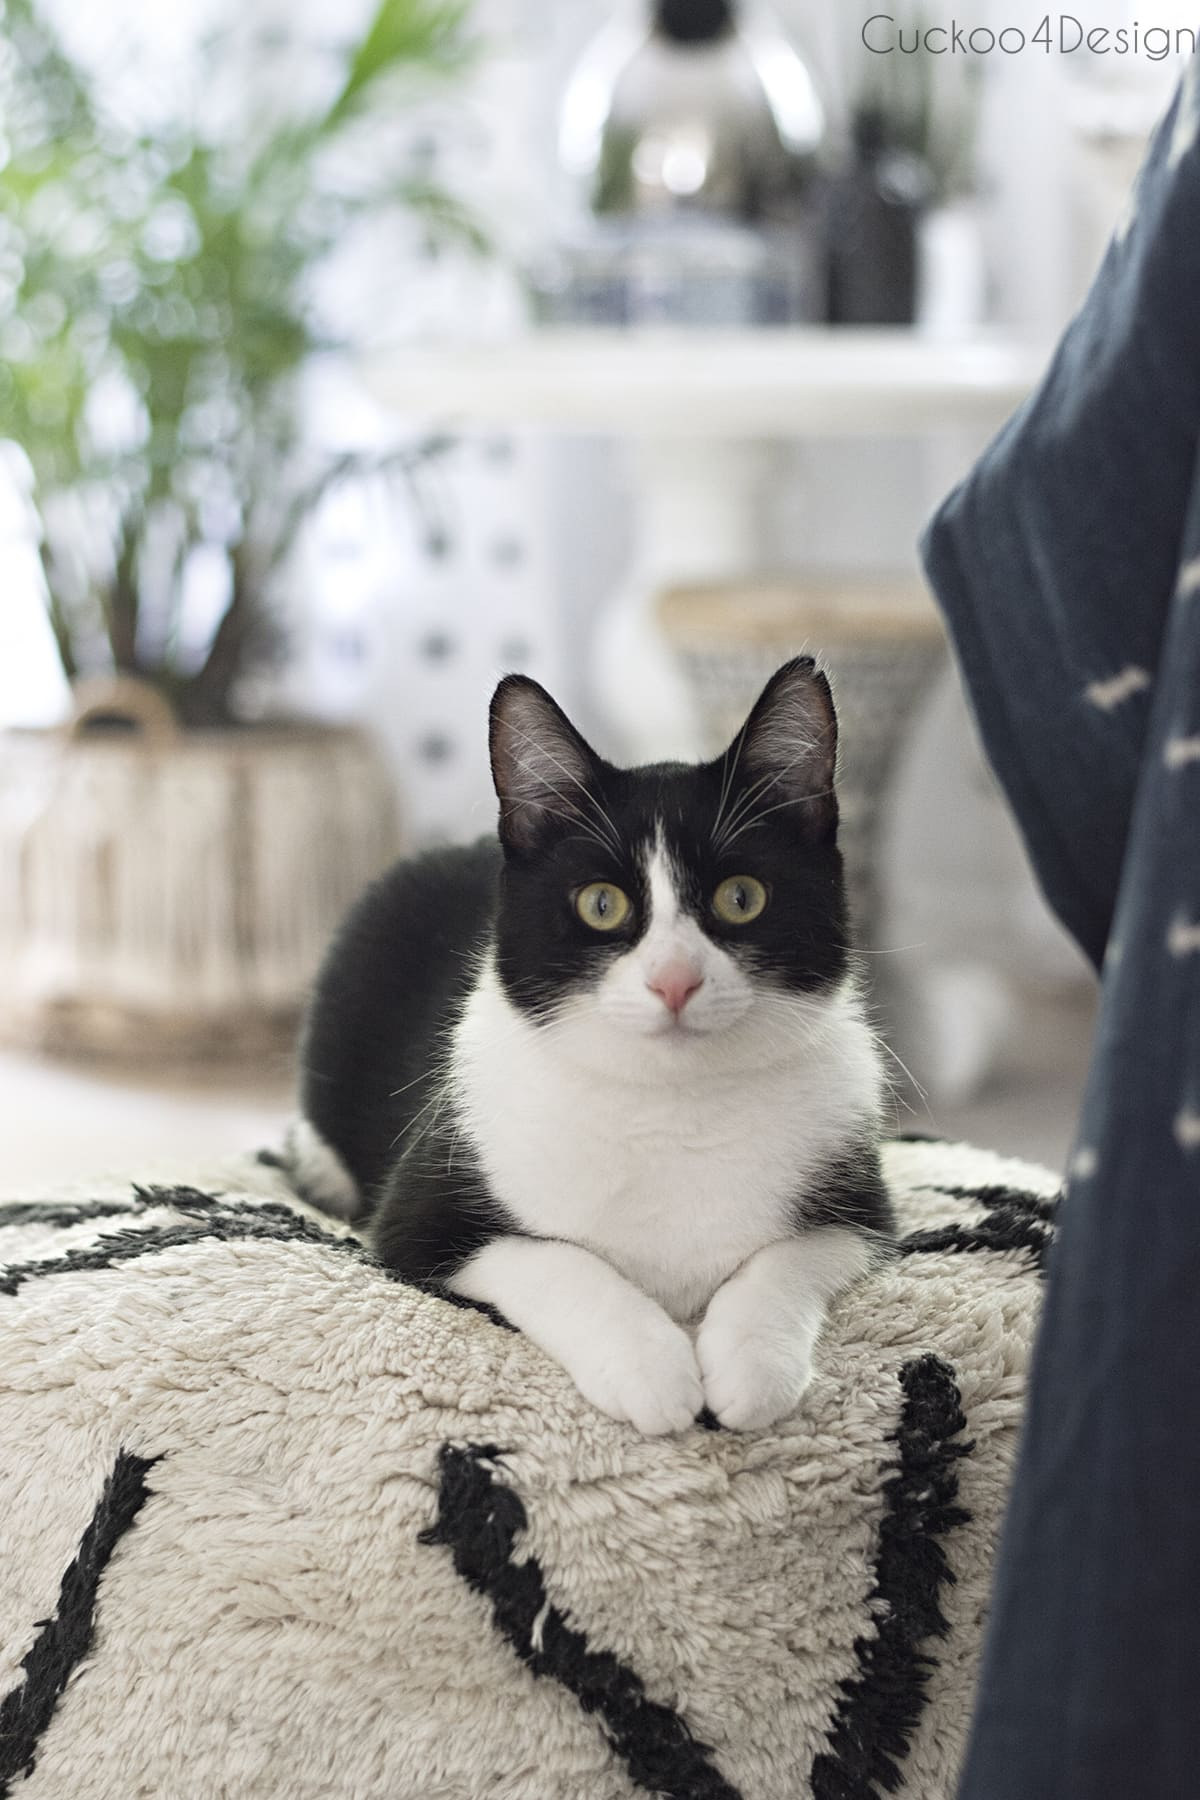 tuxedo cat posing